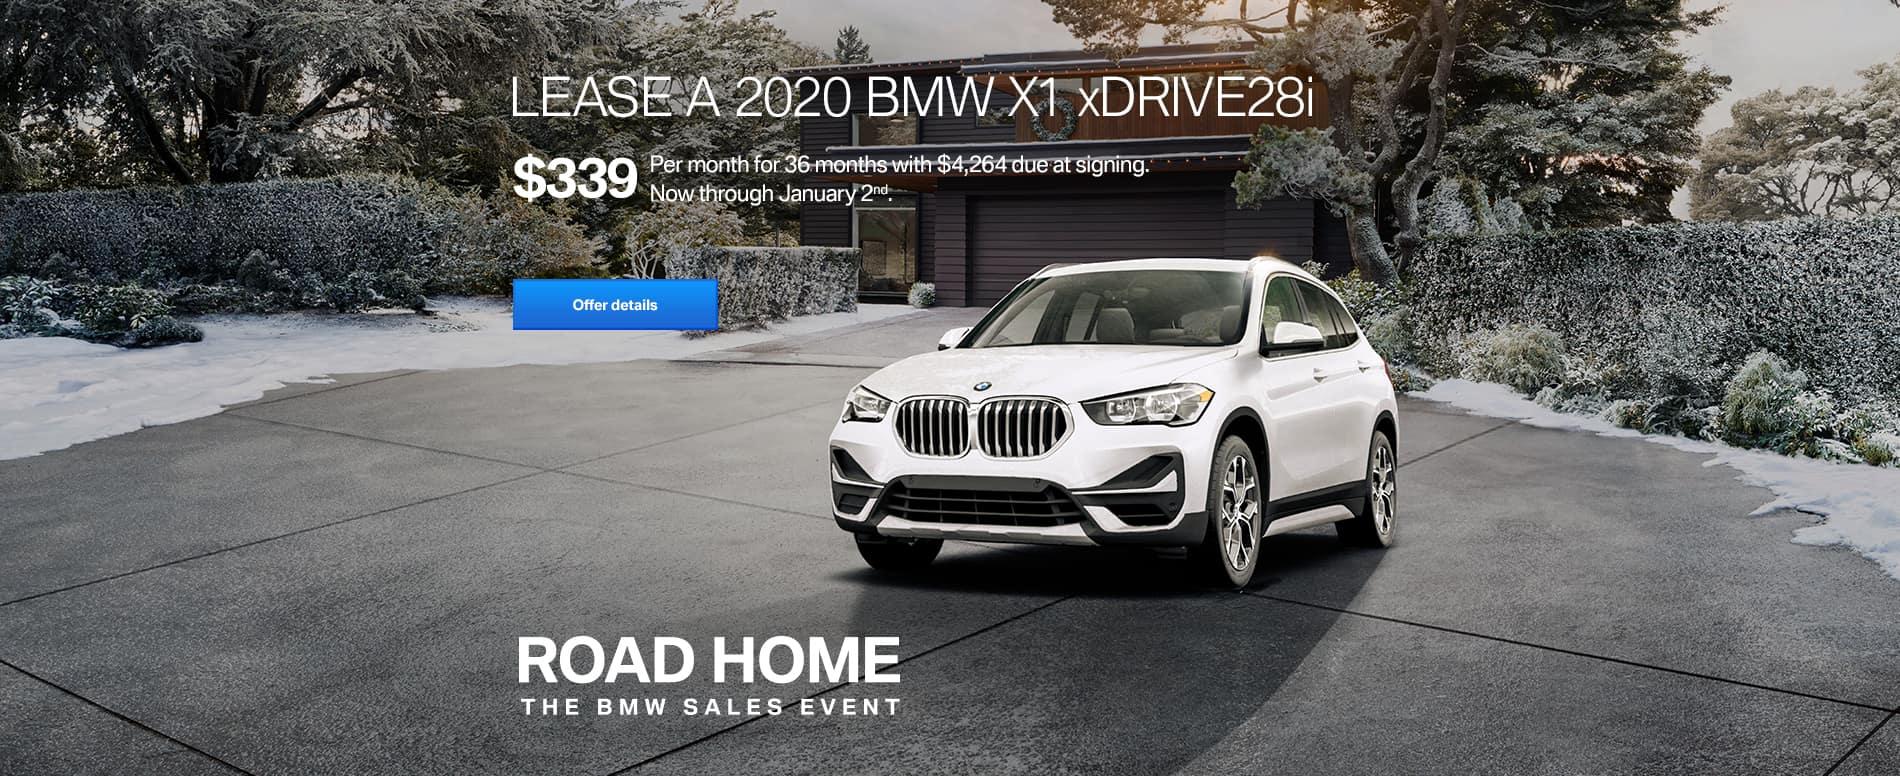 FMA3_DEC_PUSH_2020_BMW_X1_xDrive28i_339